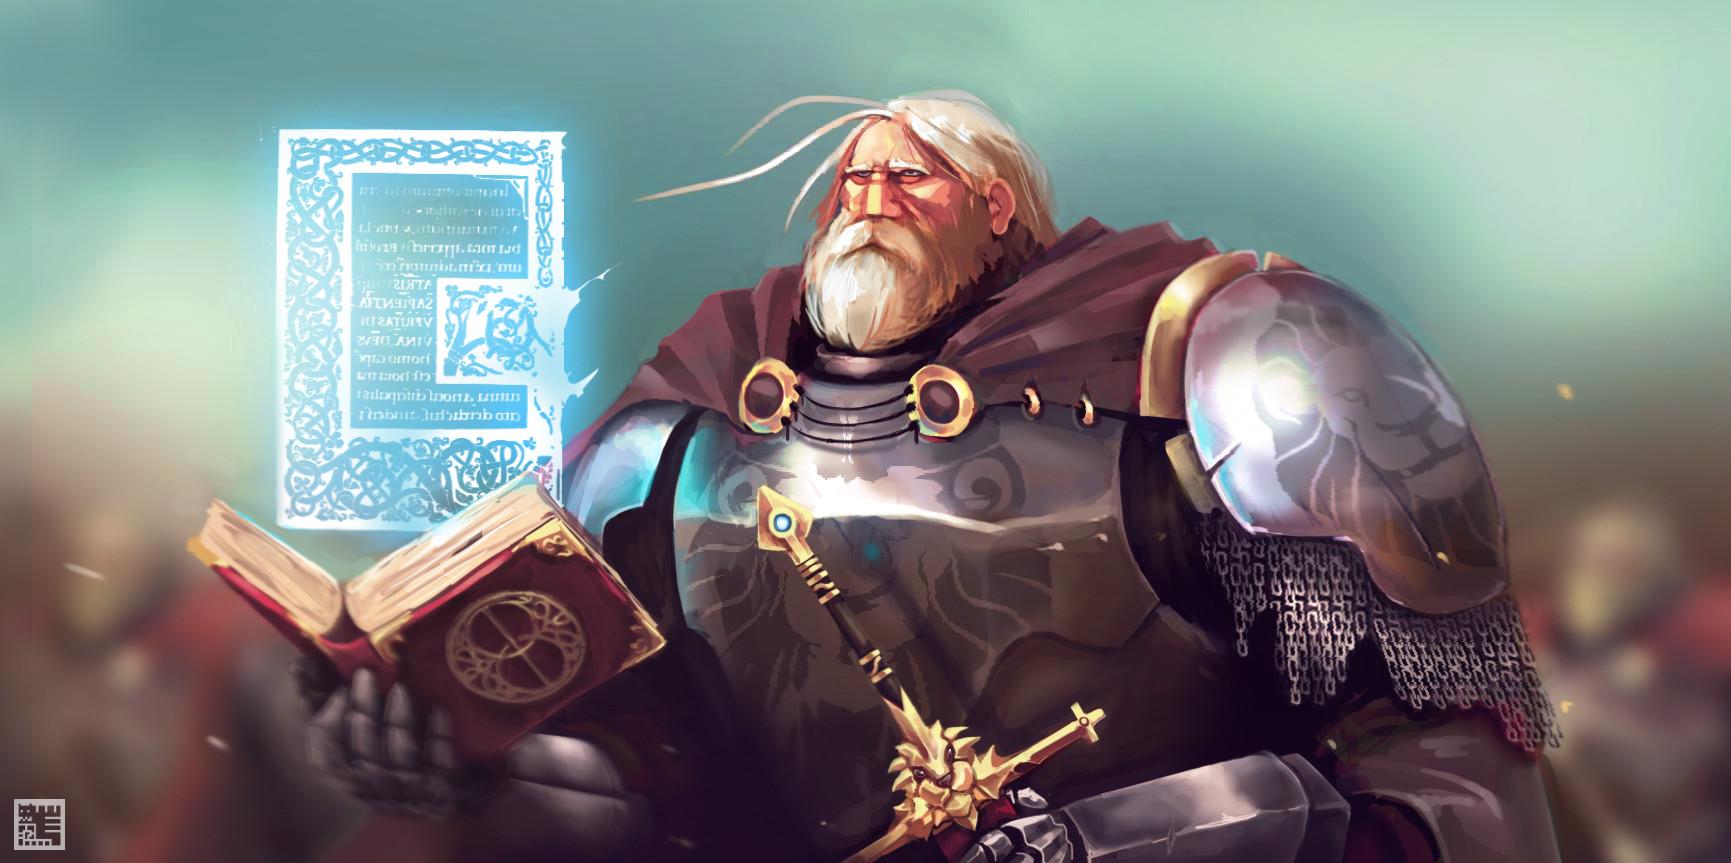 Theophile loaec knightmarron